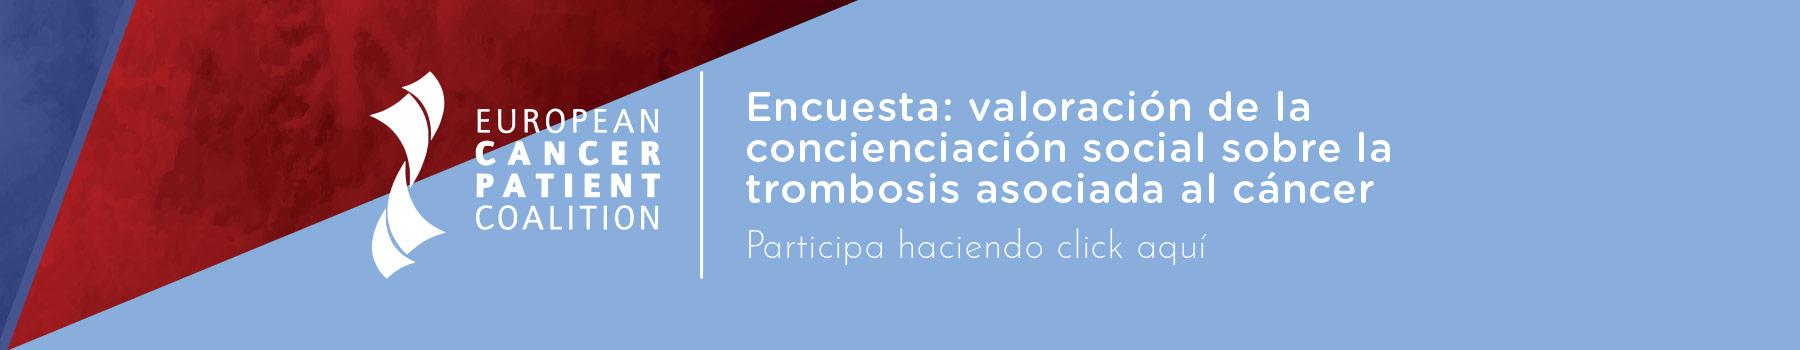 banner-encuesta-trombosis-cancer-ecpc-aeal-2018